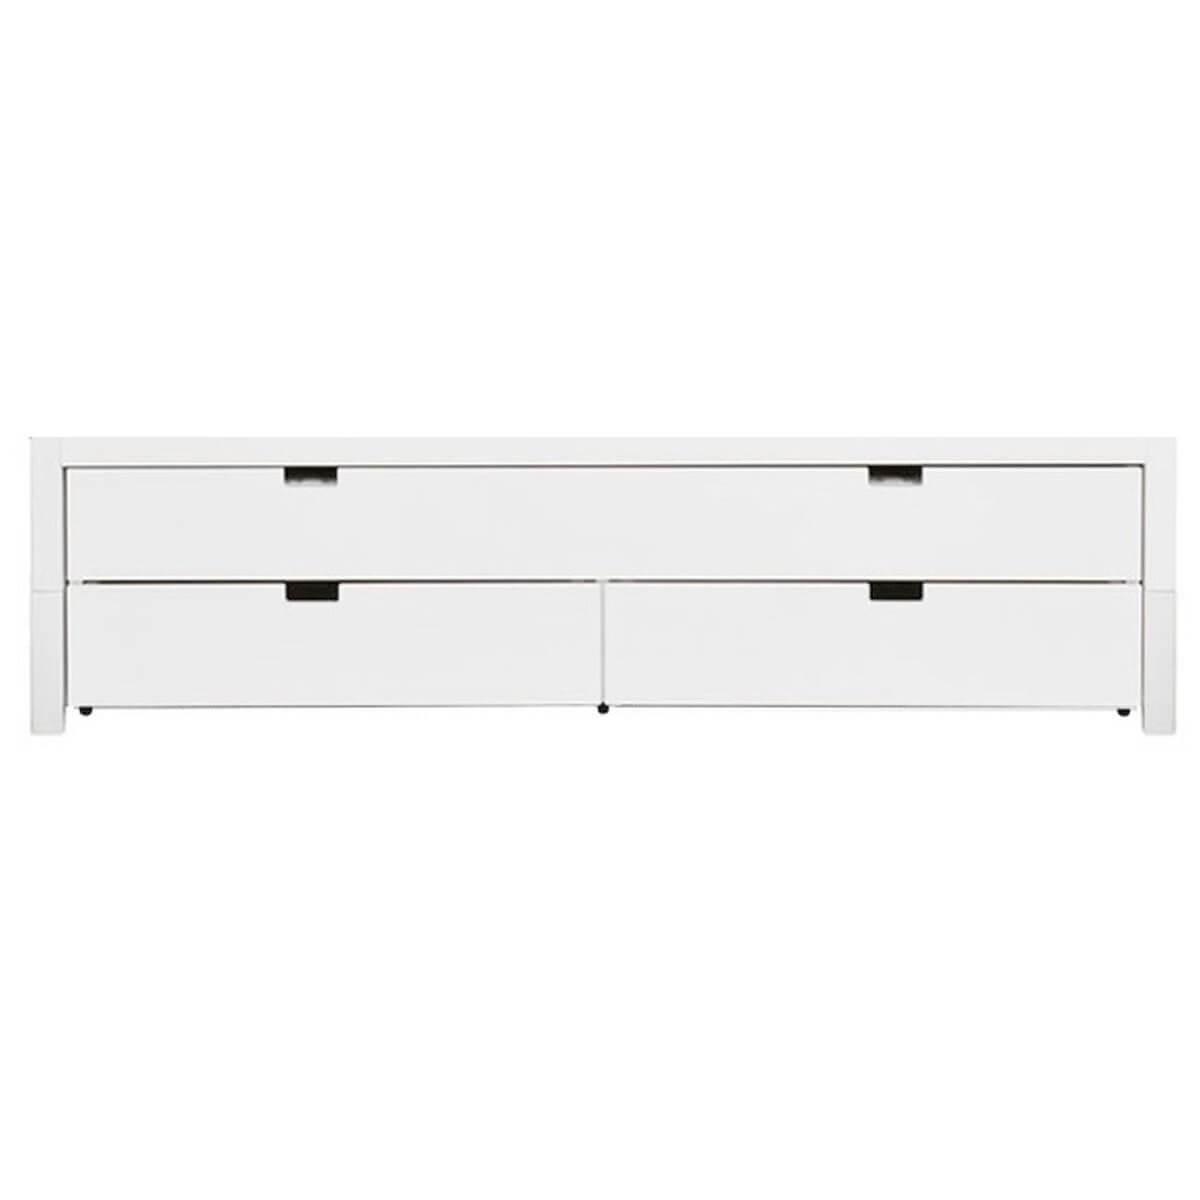 COMBIFLEX by Bopita Tiroir lit et deux tiroirs de rangement Blanc